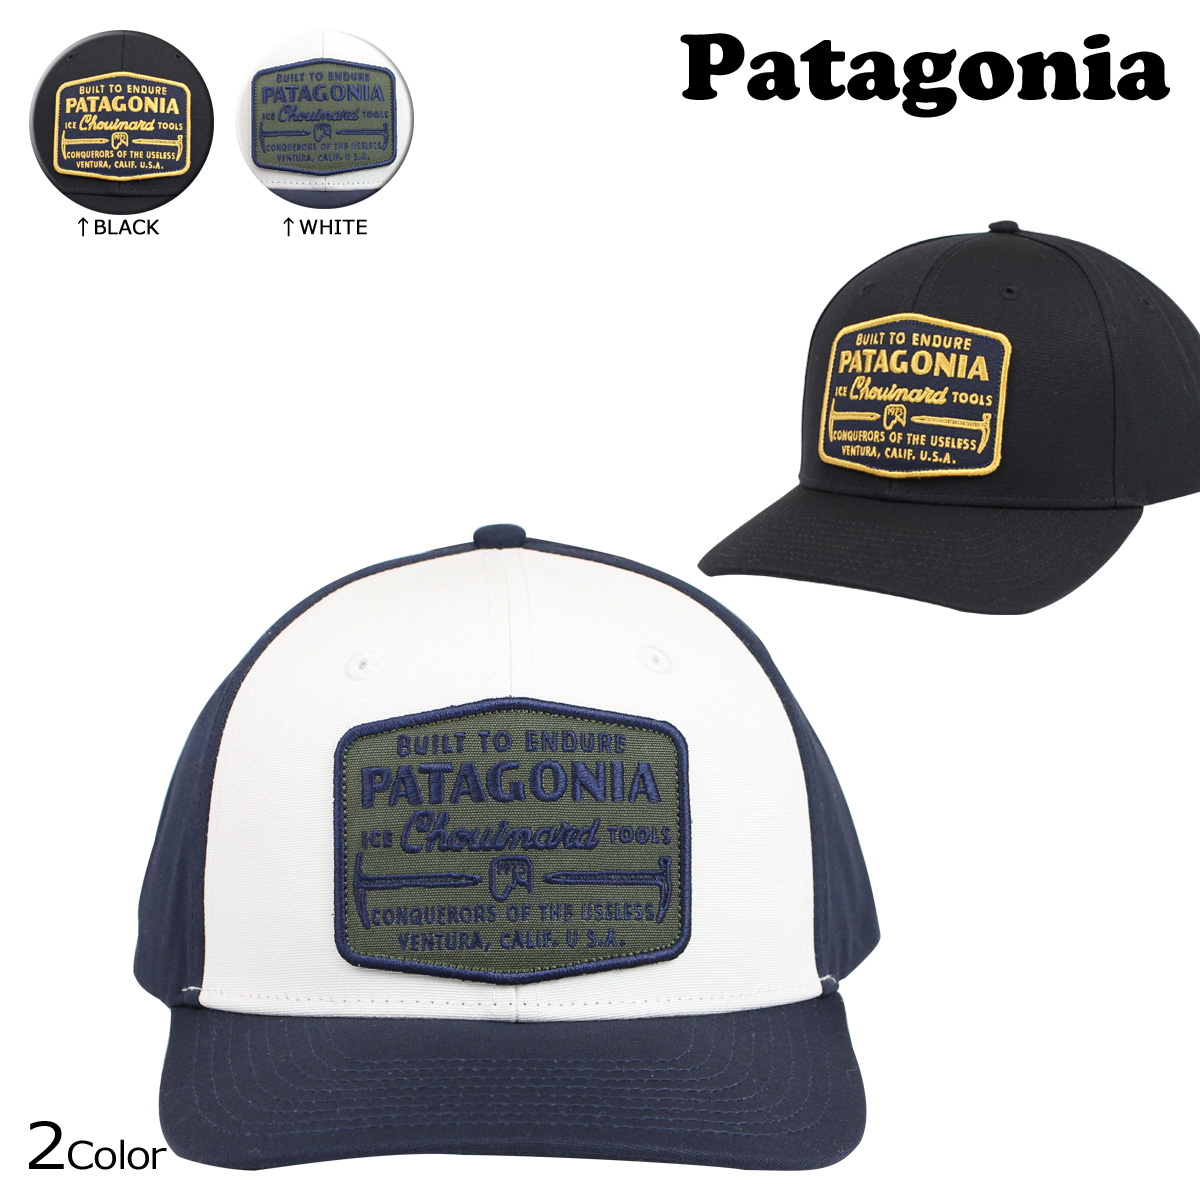 ALLSPORTS  Patagonia patagonia men s Cap snap back Cap 38045 2 color ... 5747500e62b